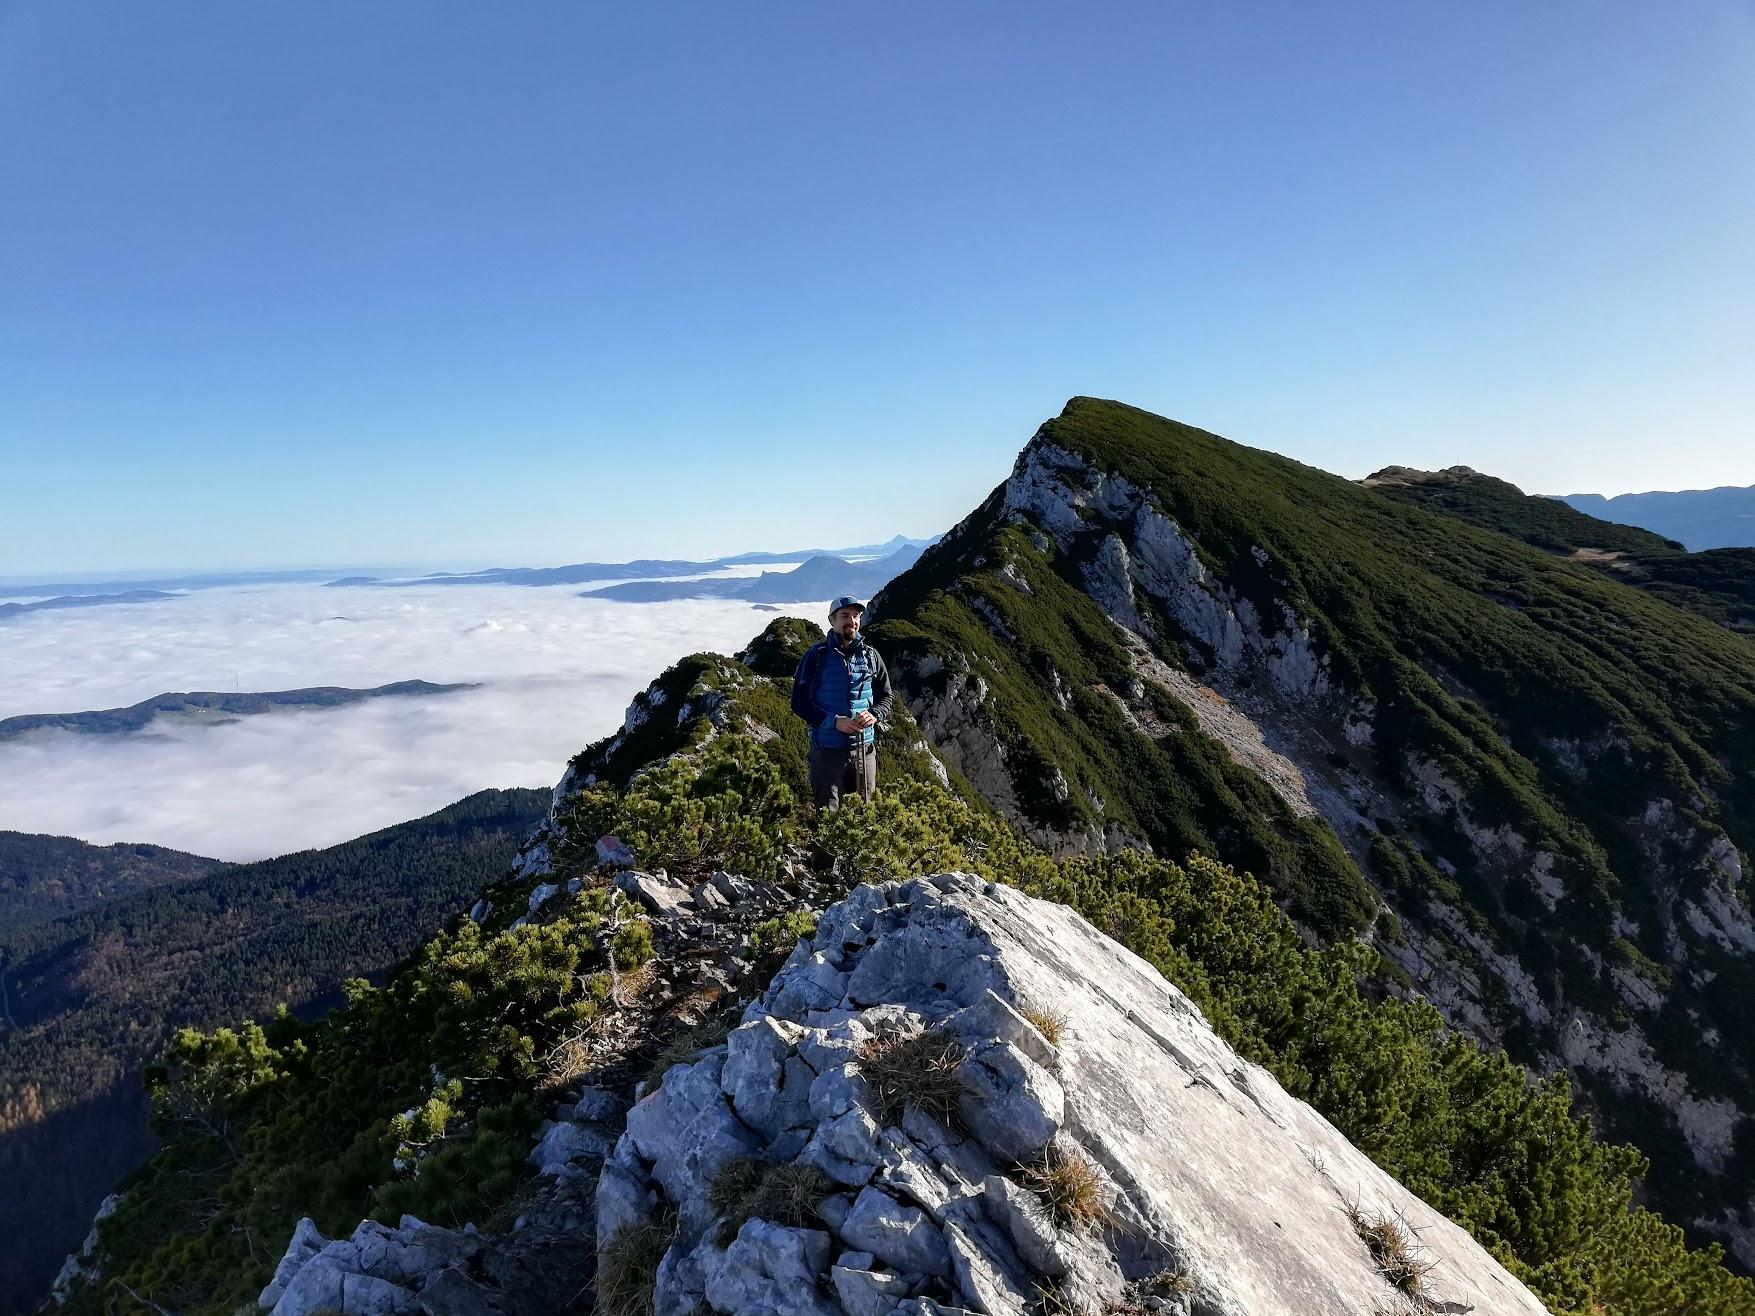 Chiemgau Alps: Staufen ridge hike - Nov 20